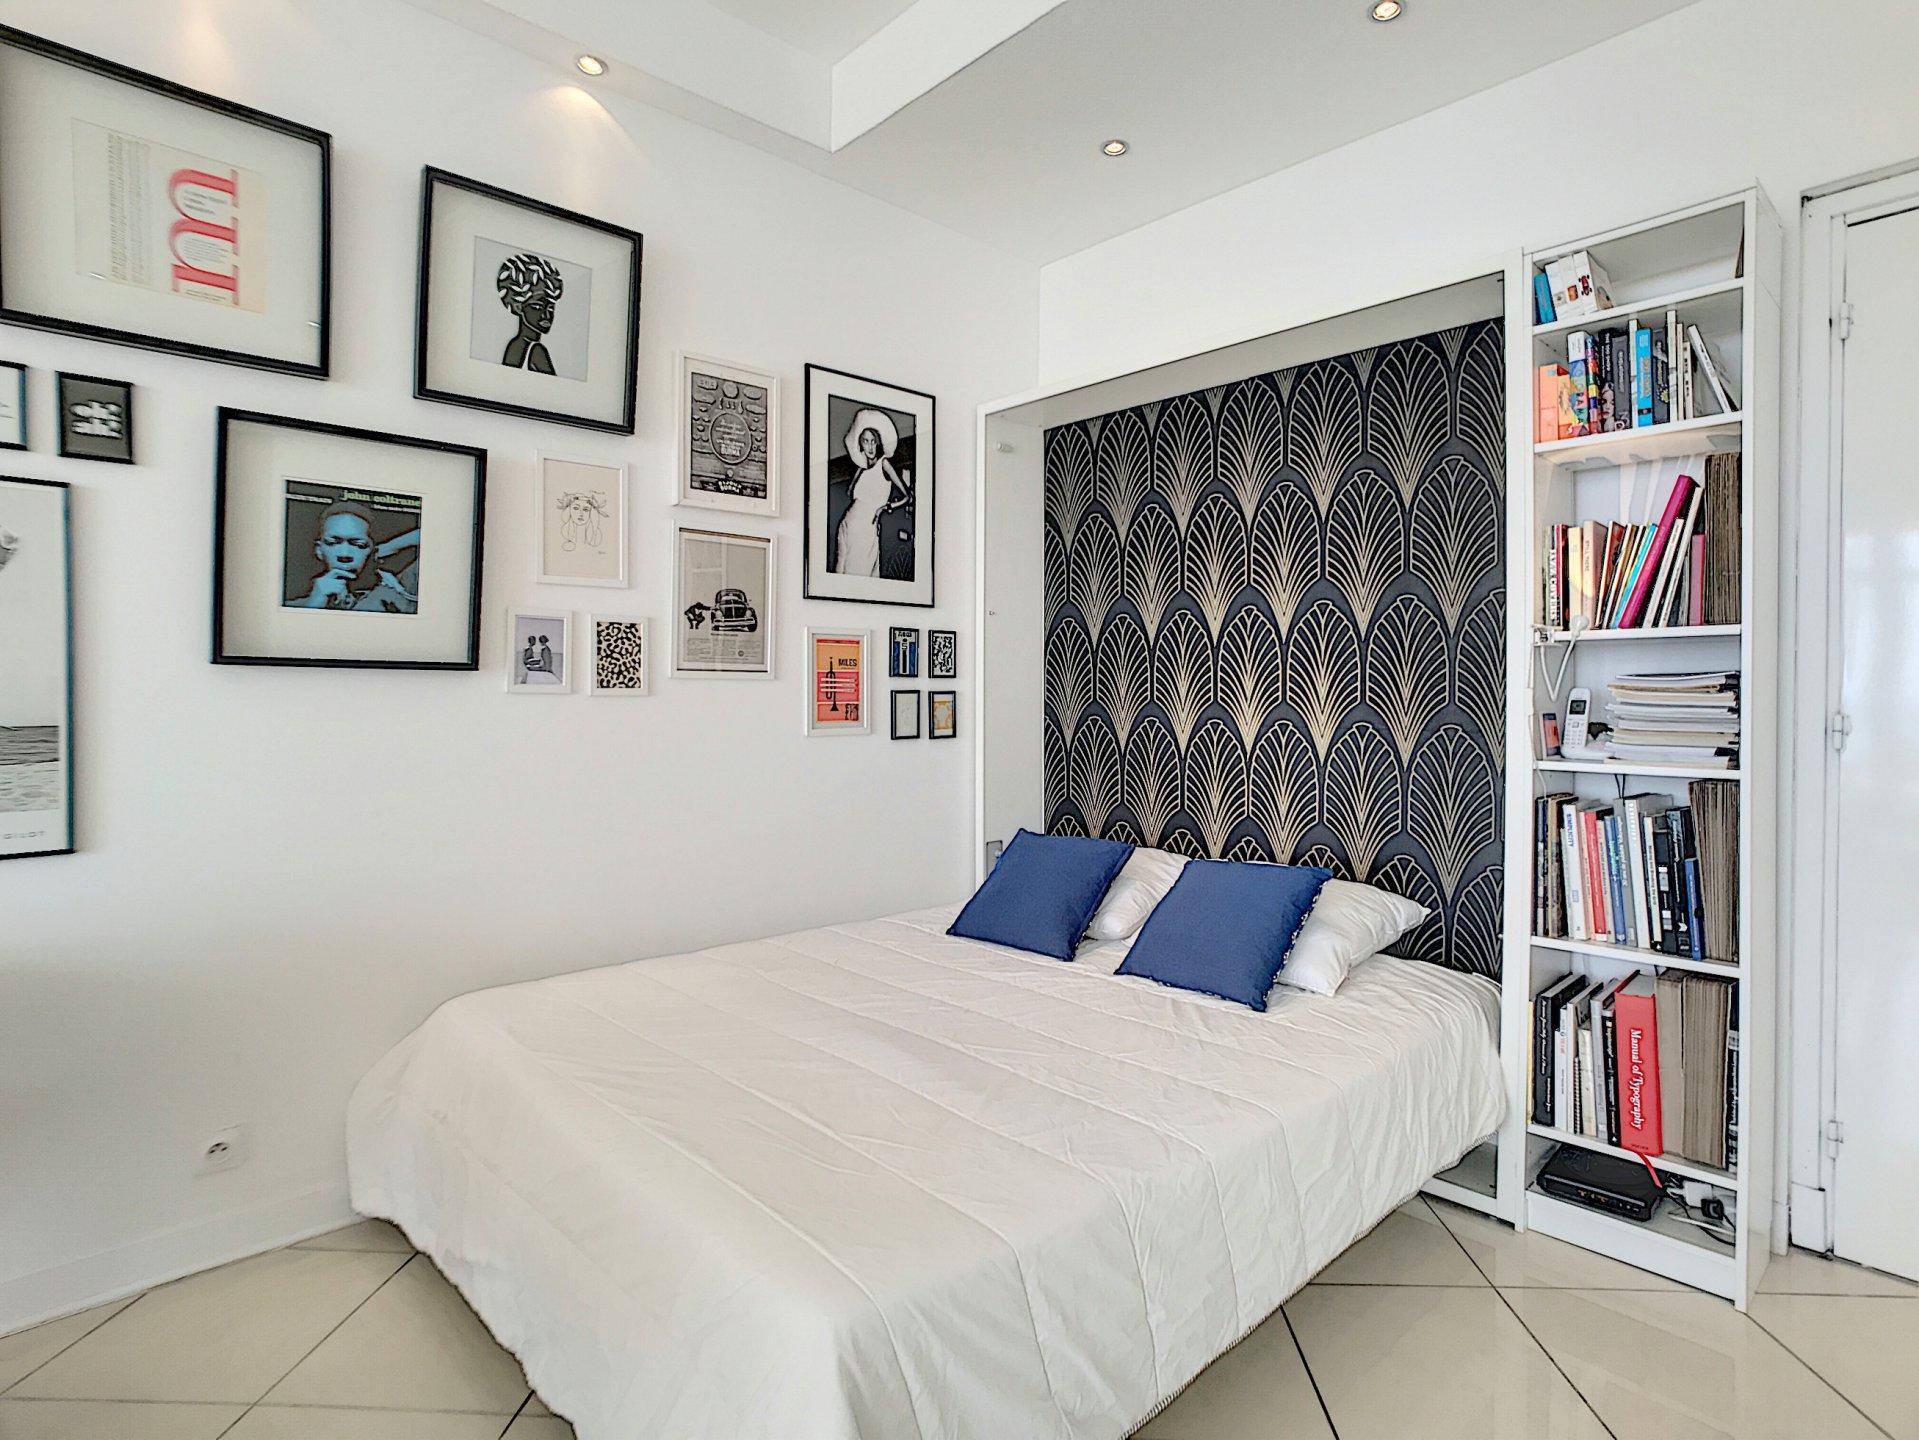 VENTE Appartement Grand Studio Luxe Nice Promenade des Anglais Vue Mer Terrasse